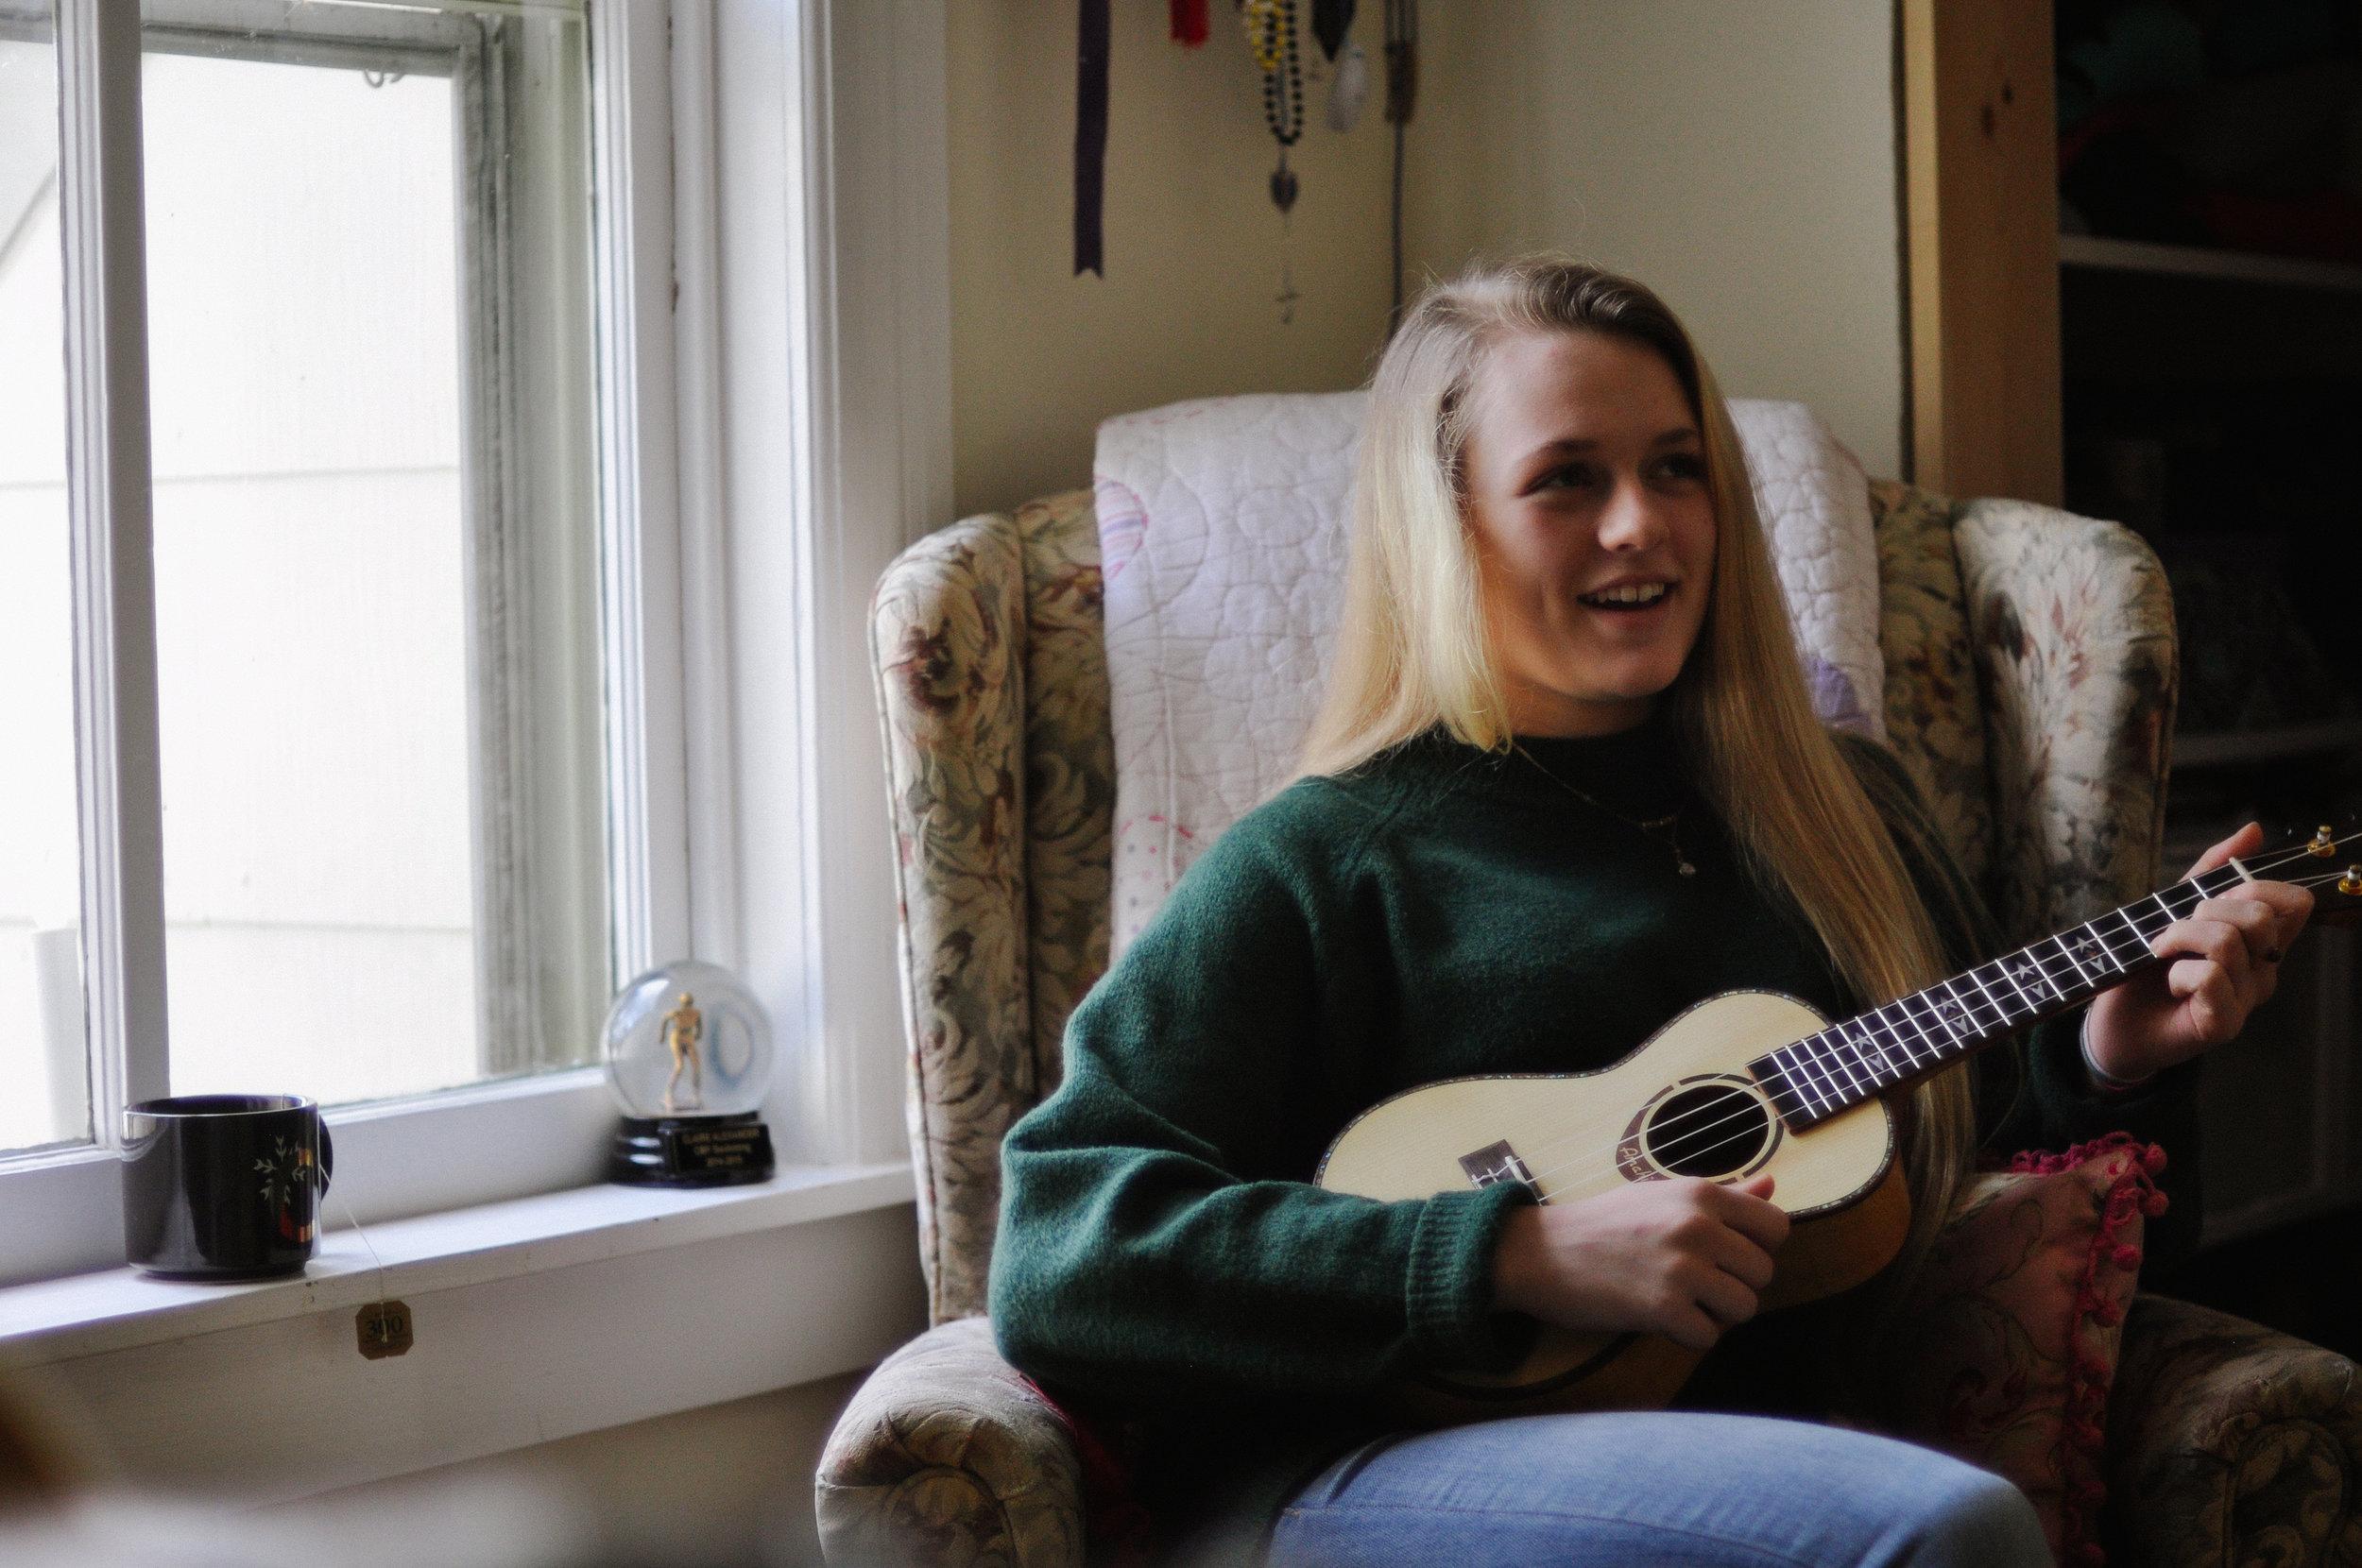 creative-family-in-home-session-farmhouse uke player 8.jpg